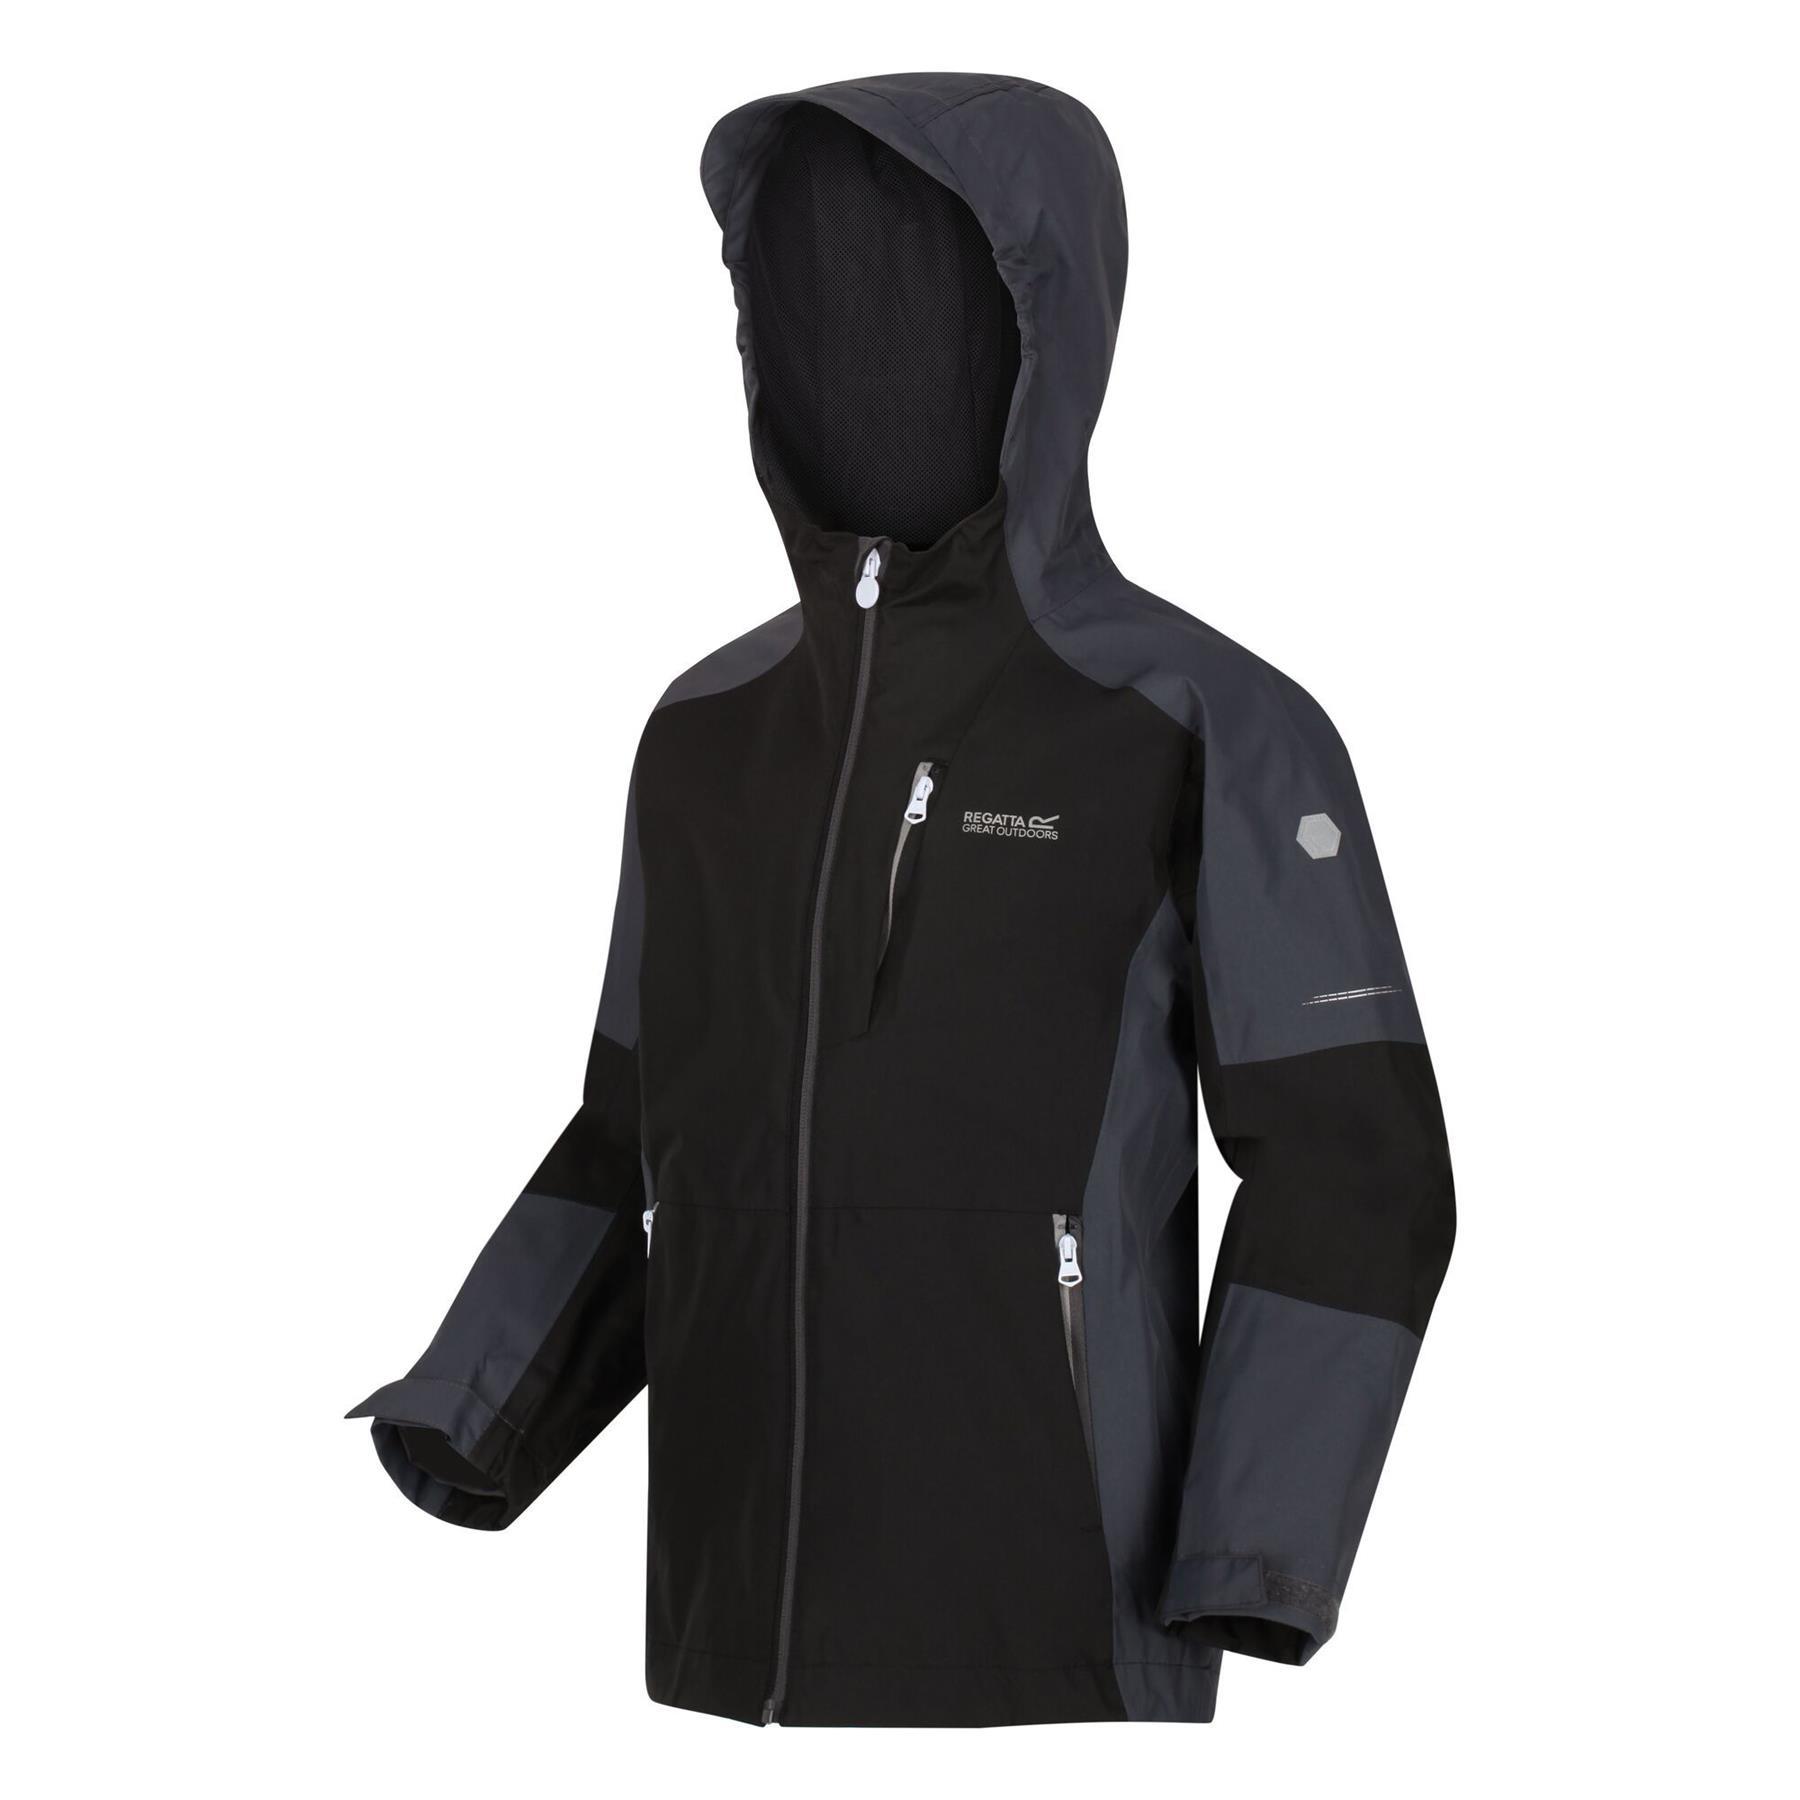 miniatuur 7 - Regatta Kids Calderdale II Waterproof Hooded Zip Pocket Jacket Boy Girls Coat